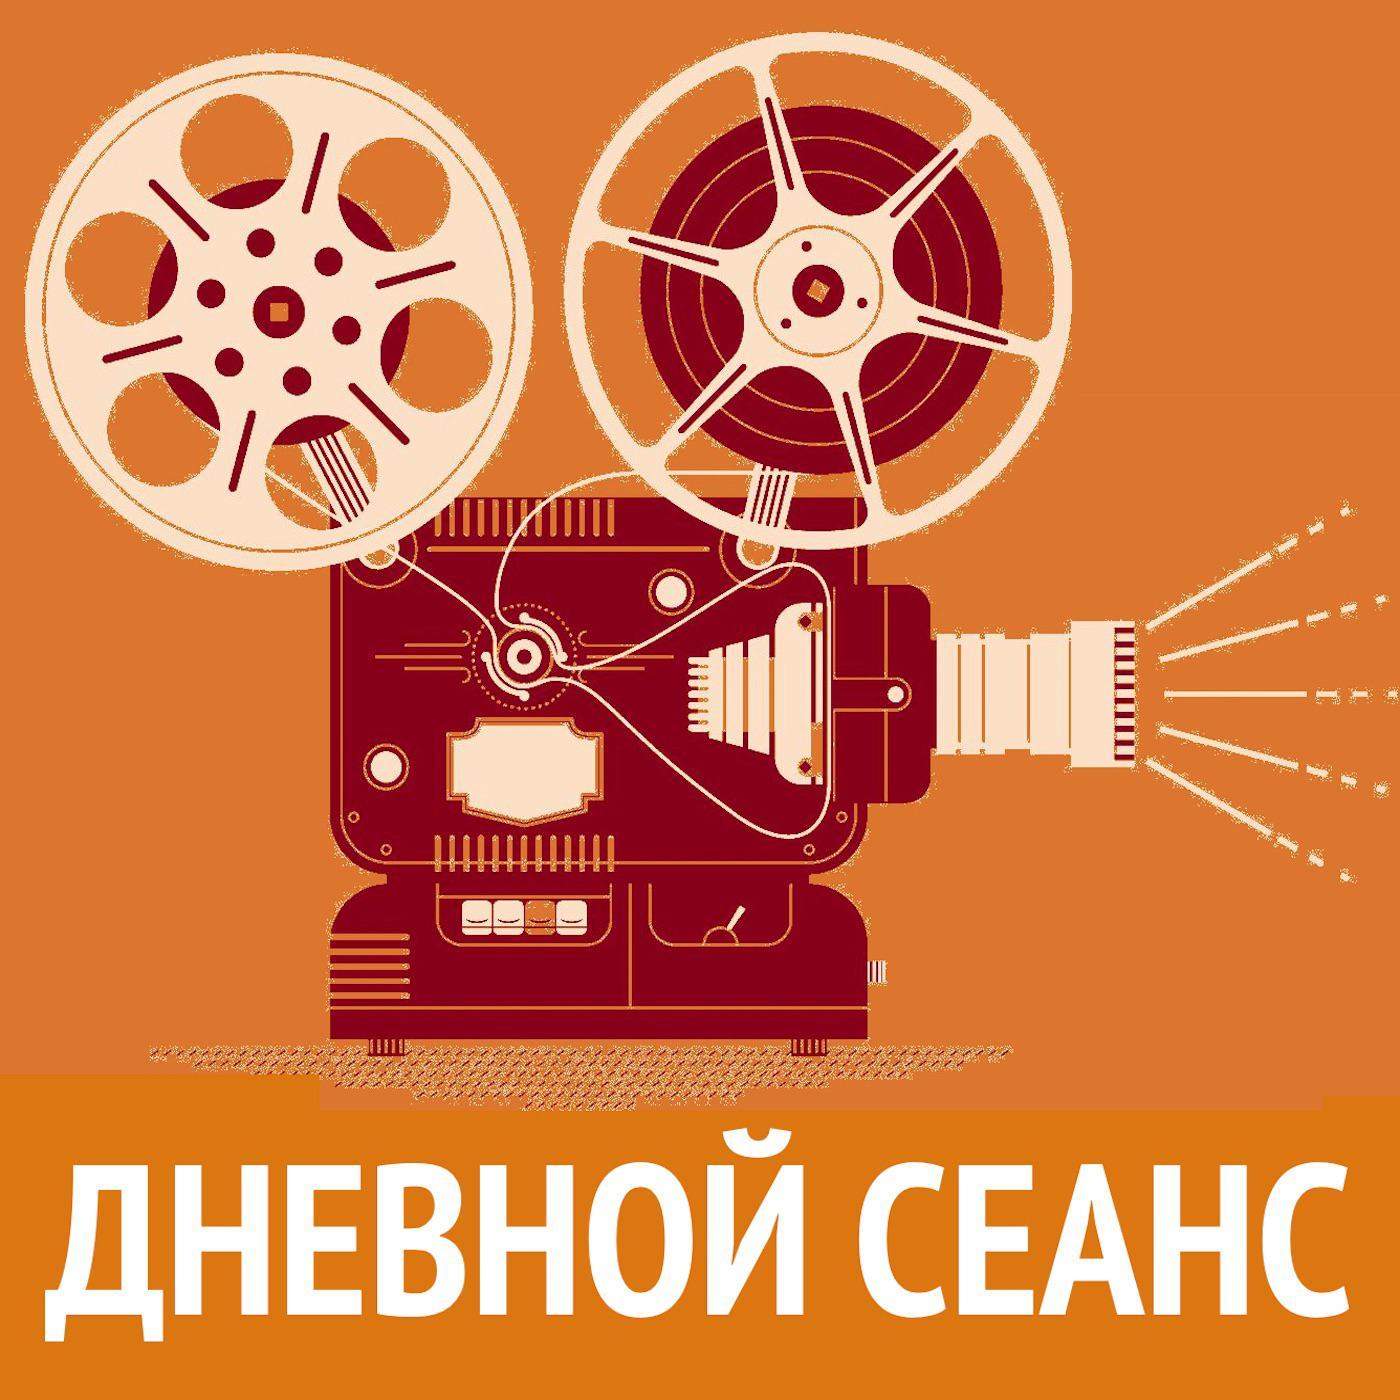 "Алек Болдуин в программе \""Актеры Голливуда\"" с Ильей Либманом."